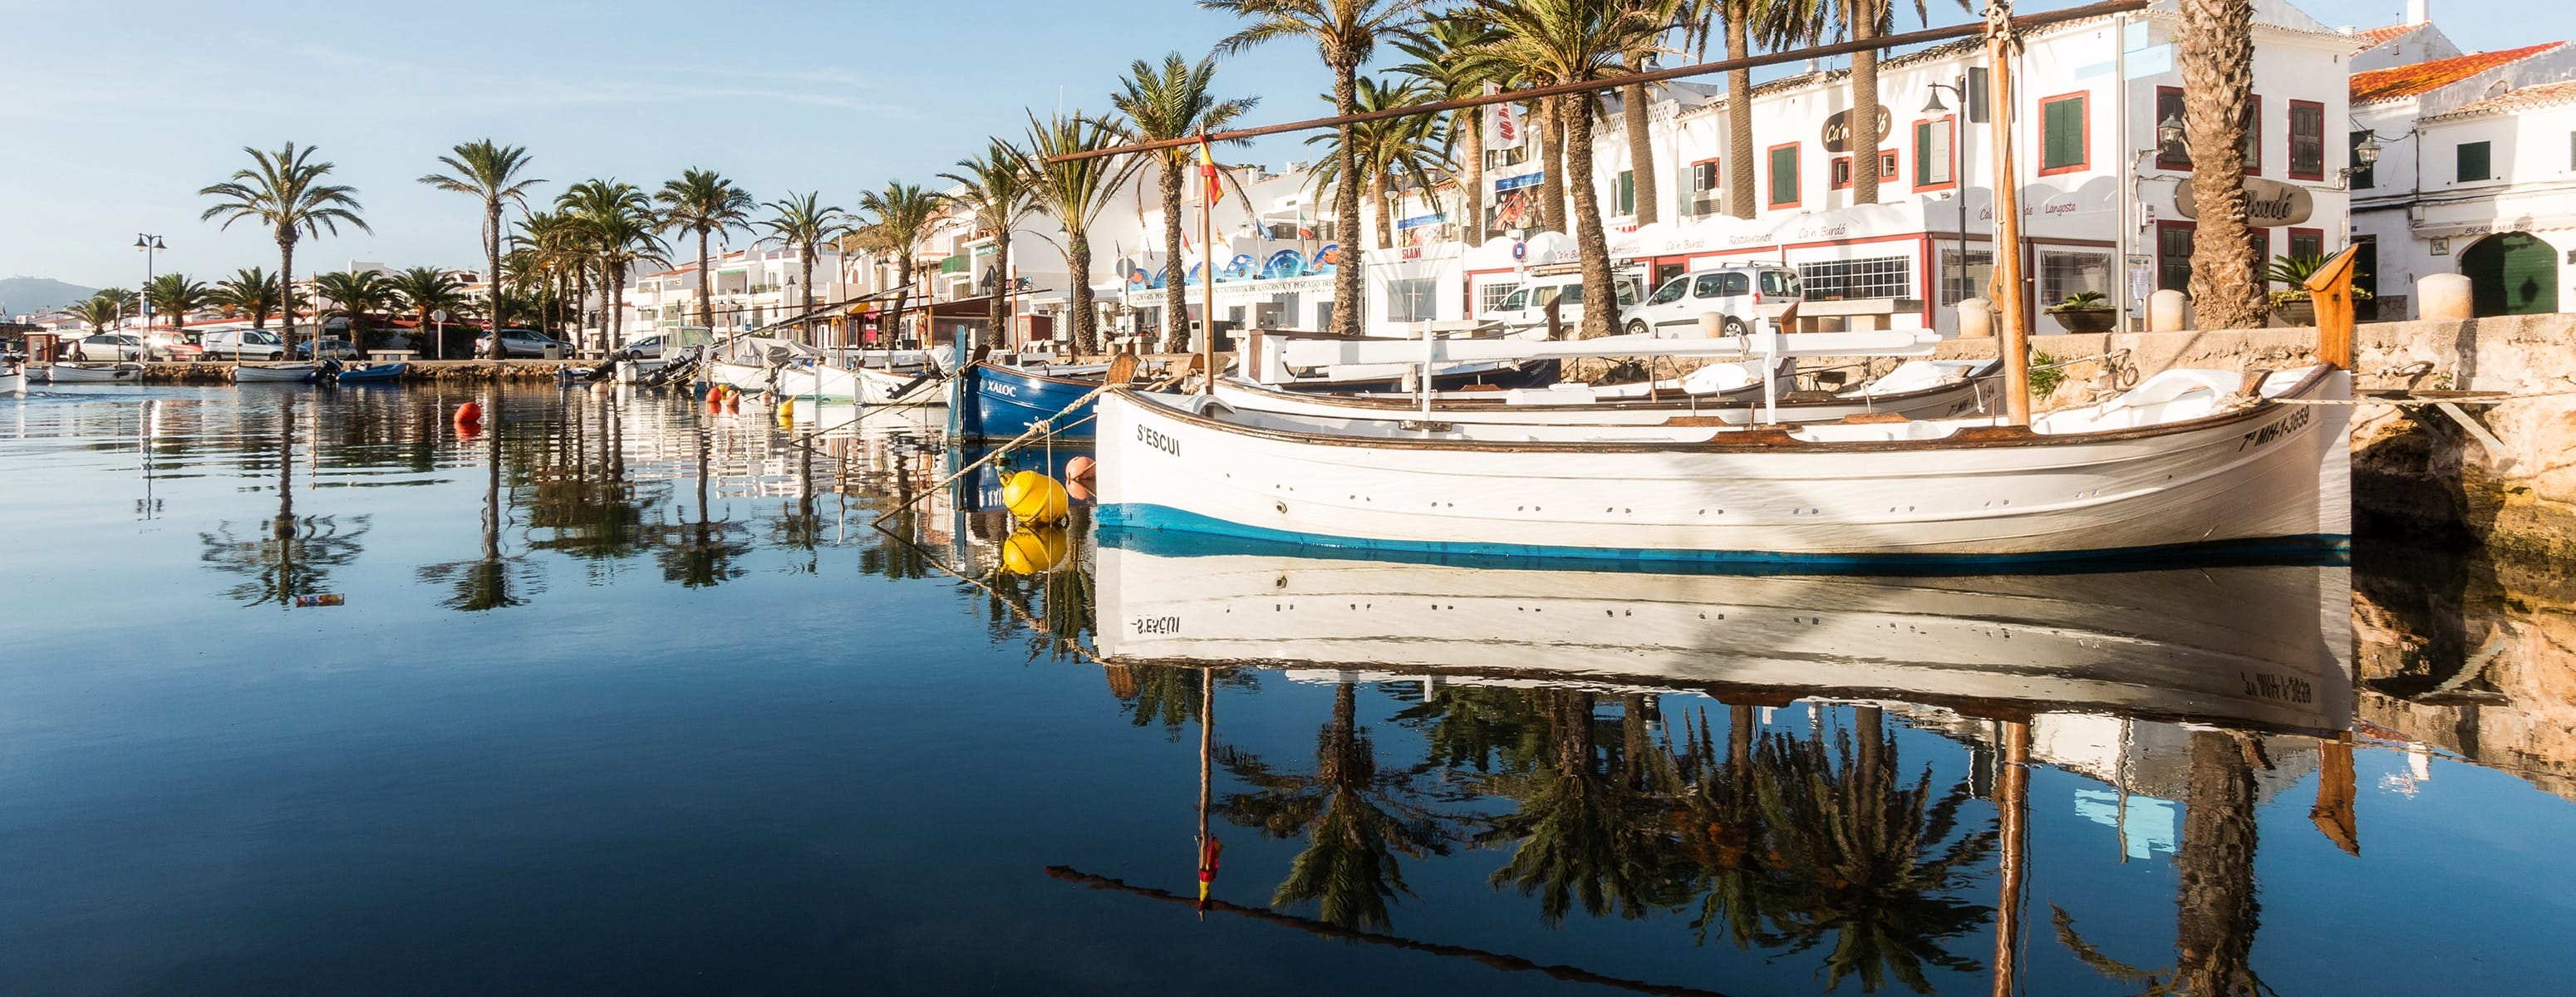 Vacation rentals in Playas de Fornells